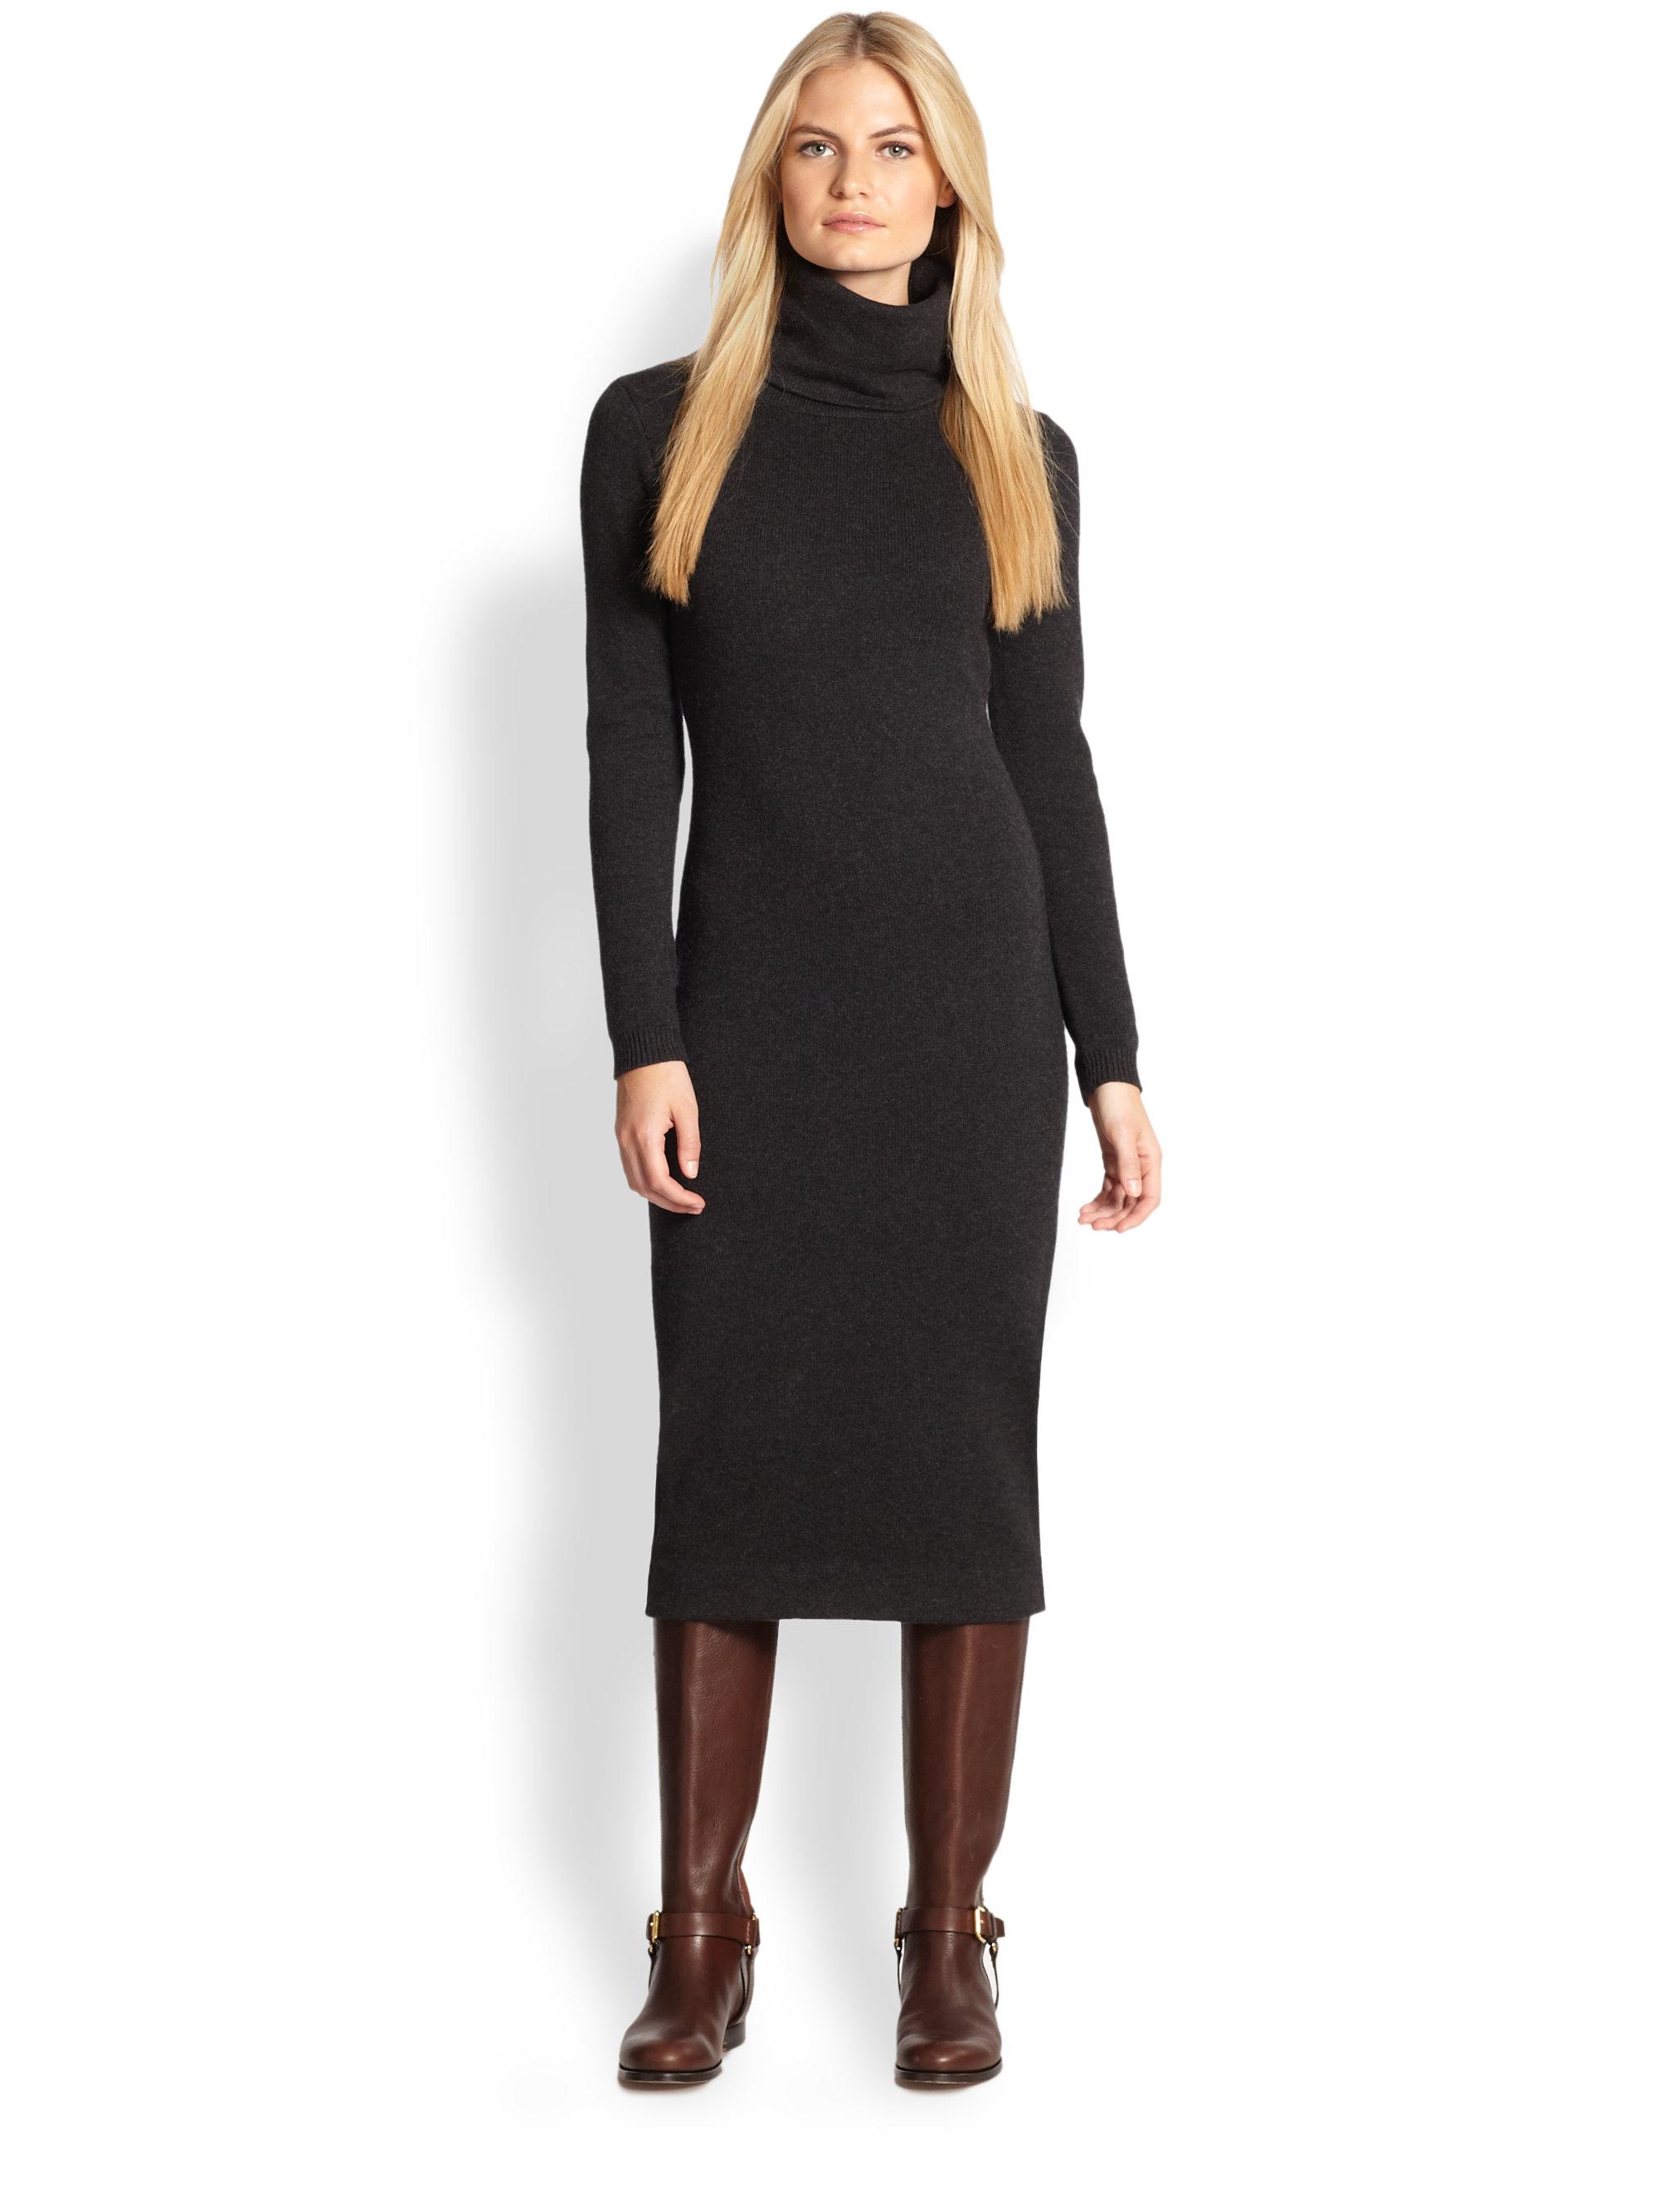 Ralph lauren black label Cashmere Turtleneck Dress in ...